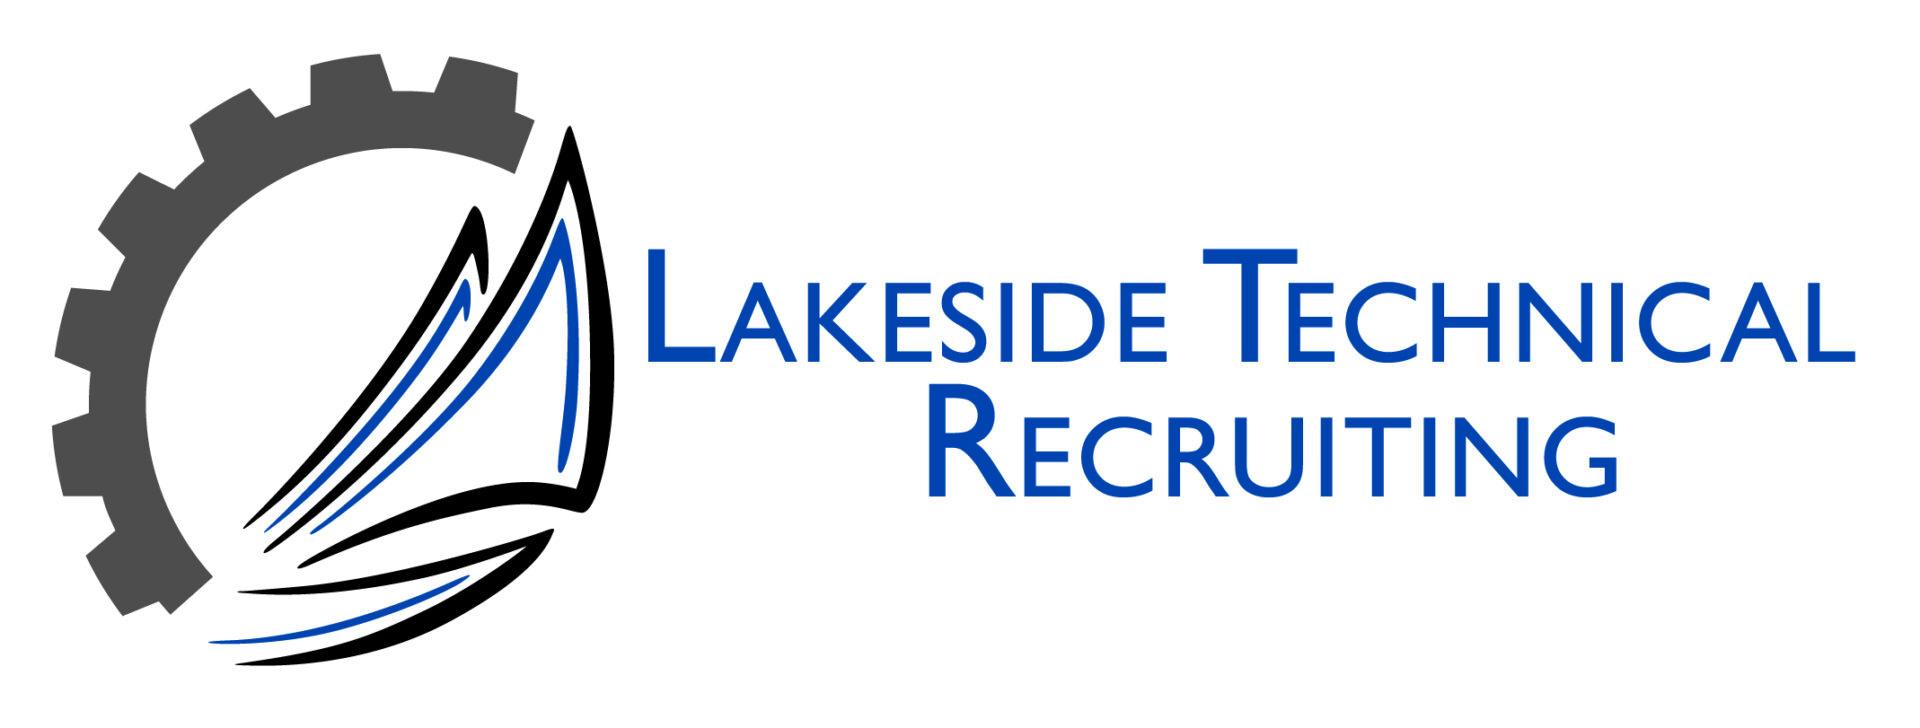 Lakeside Technical Recruiting